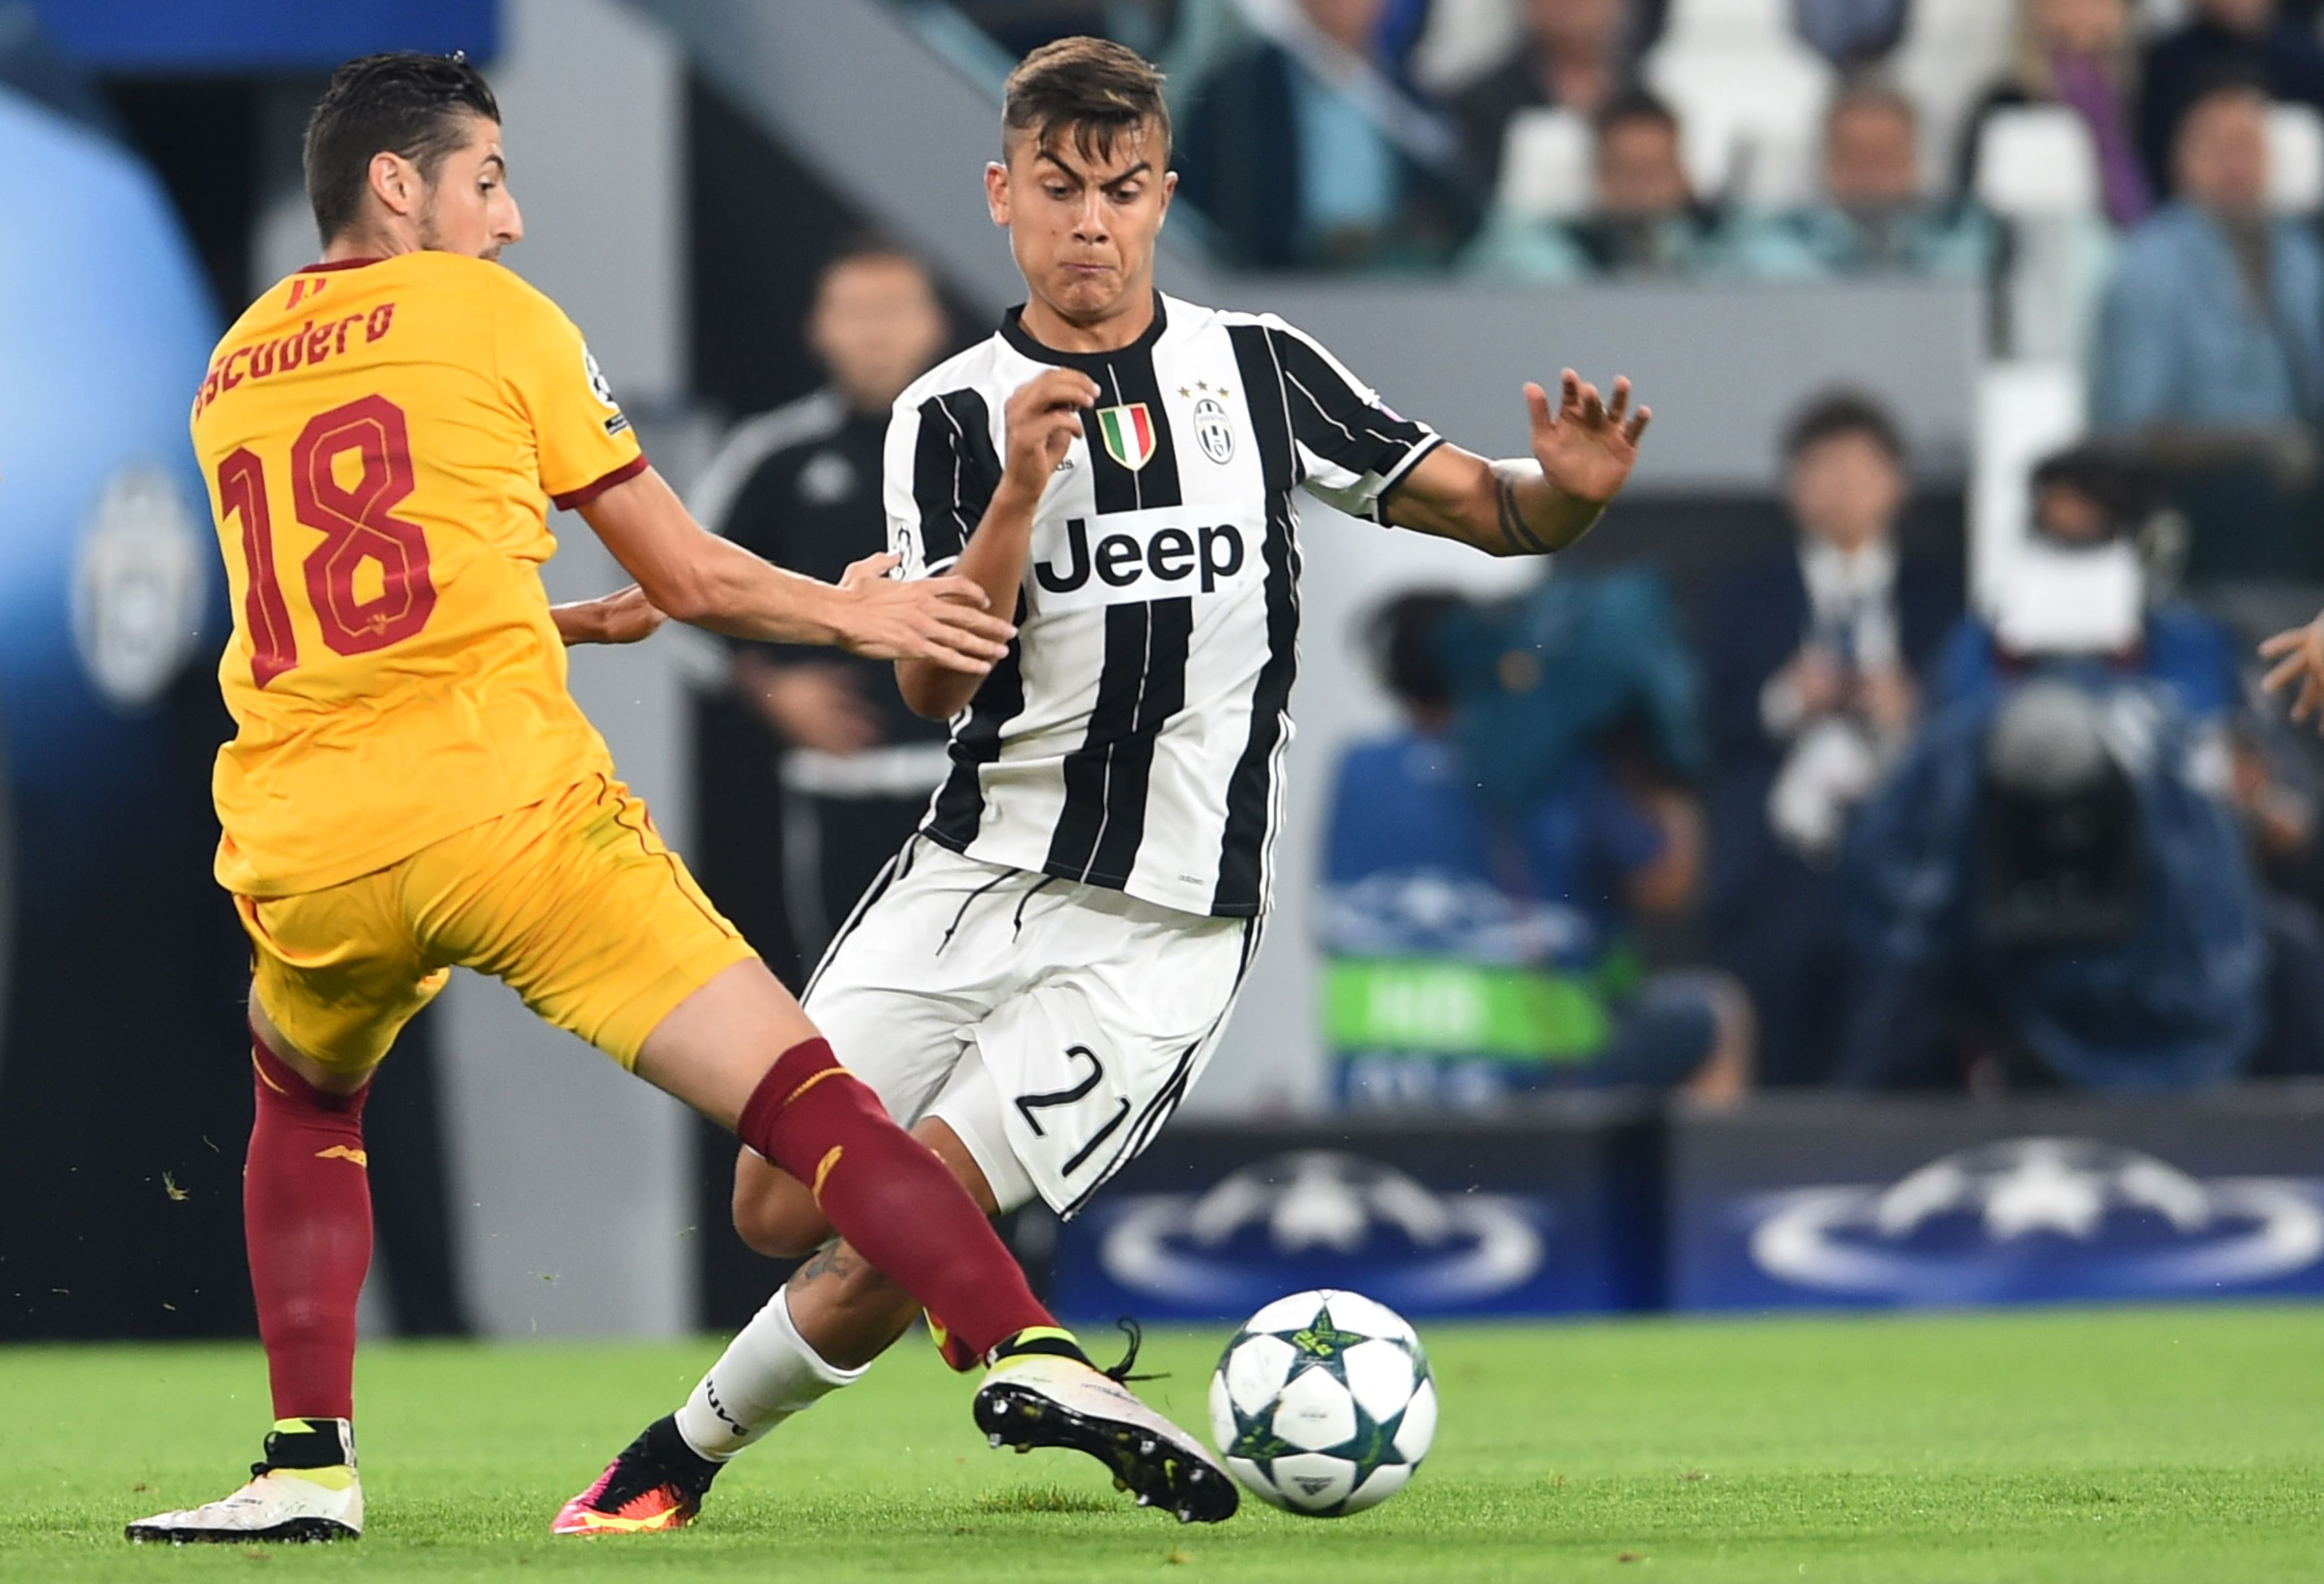 La Juventus de Dybala e Higuaín empató sin goles ante el Sevilla de Sampaoli